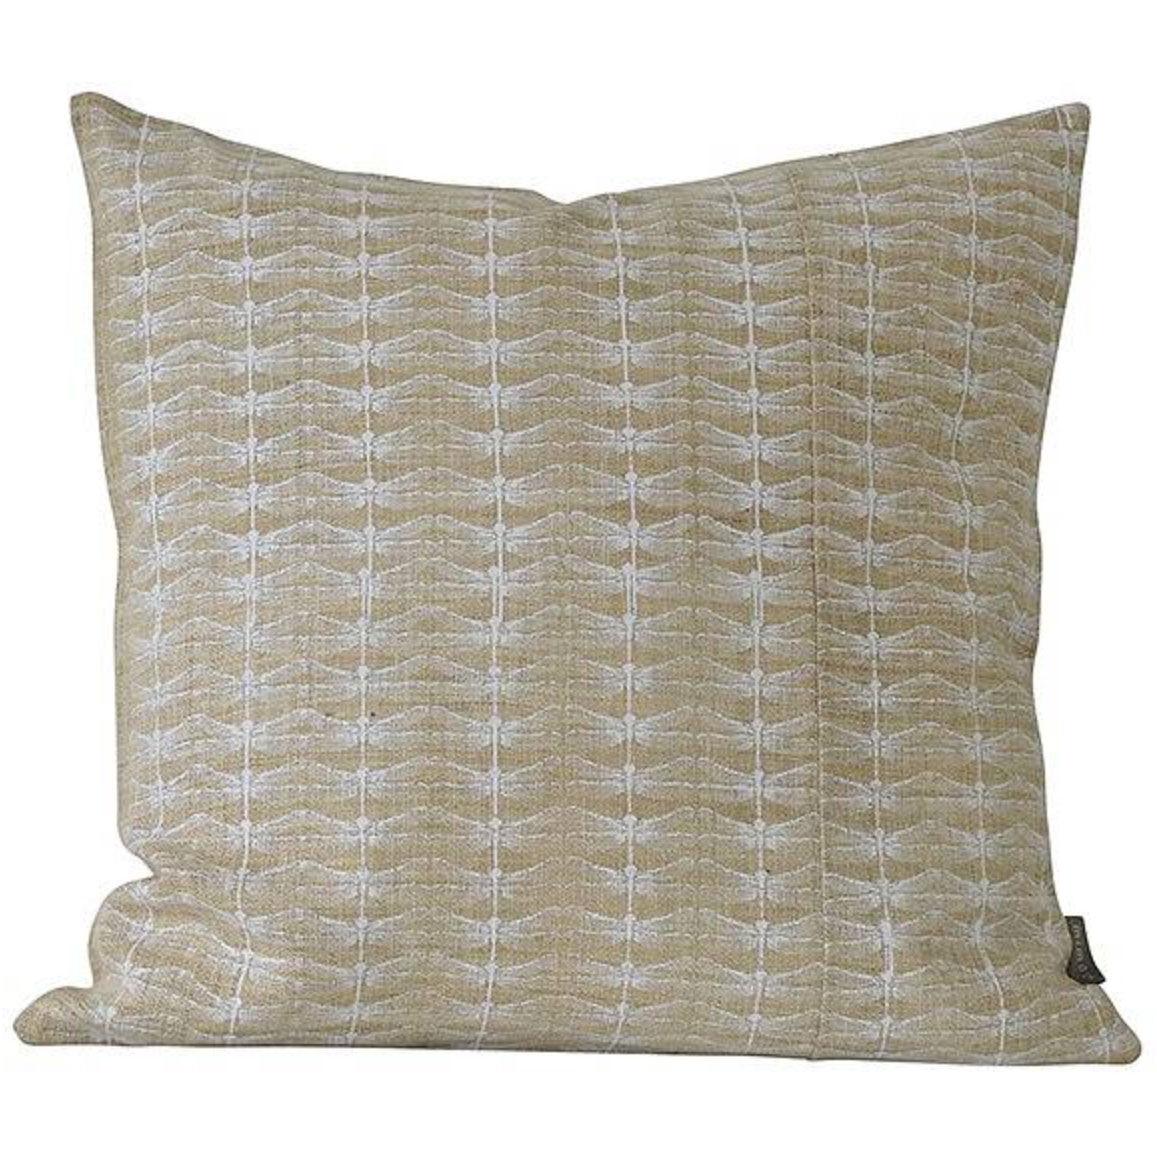 Mimou-Dragonfly Cushion 50x50 cm, White